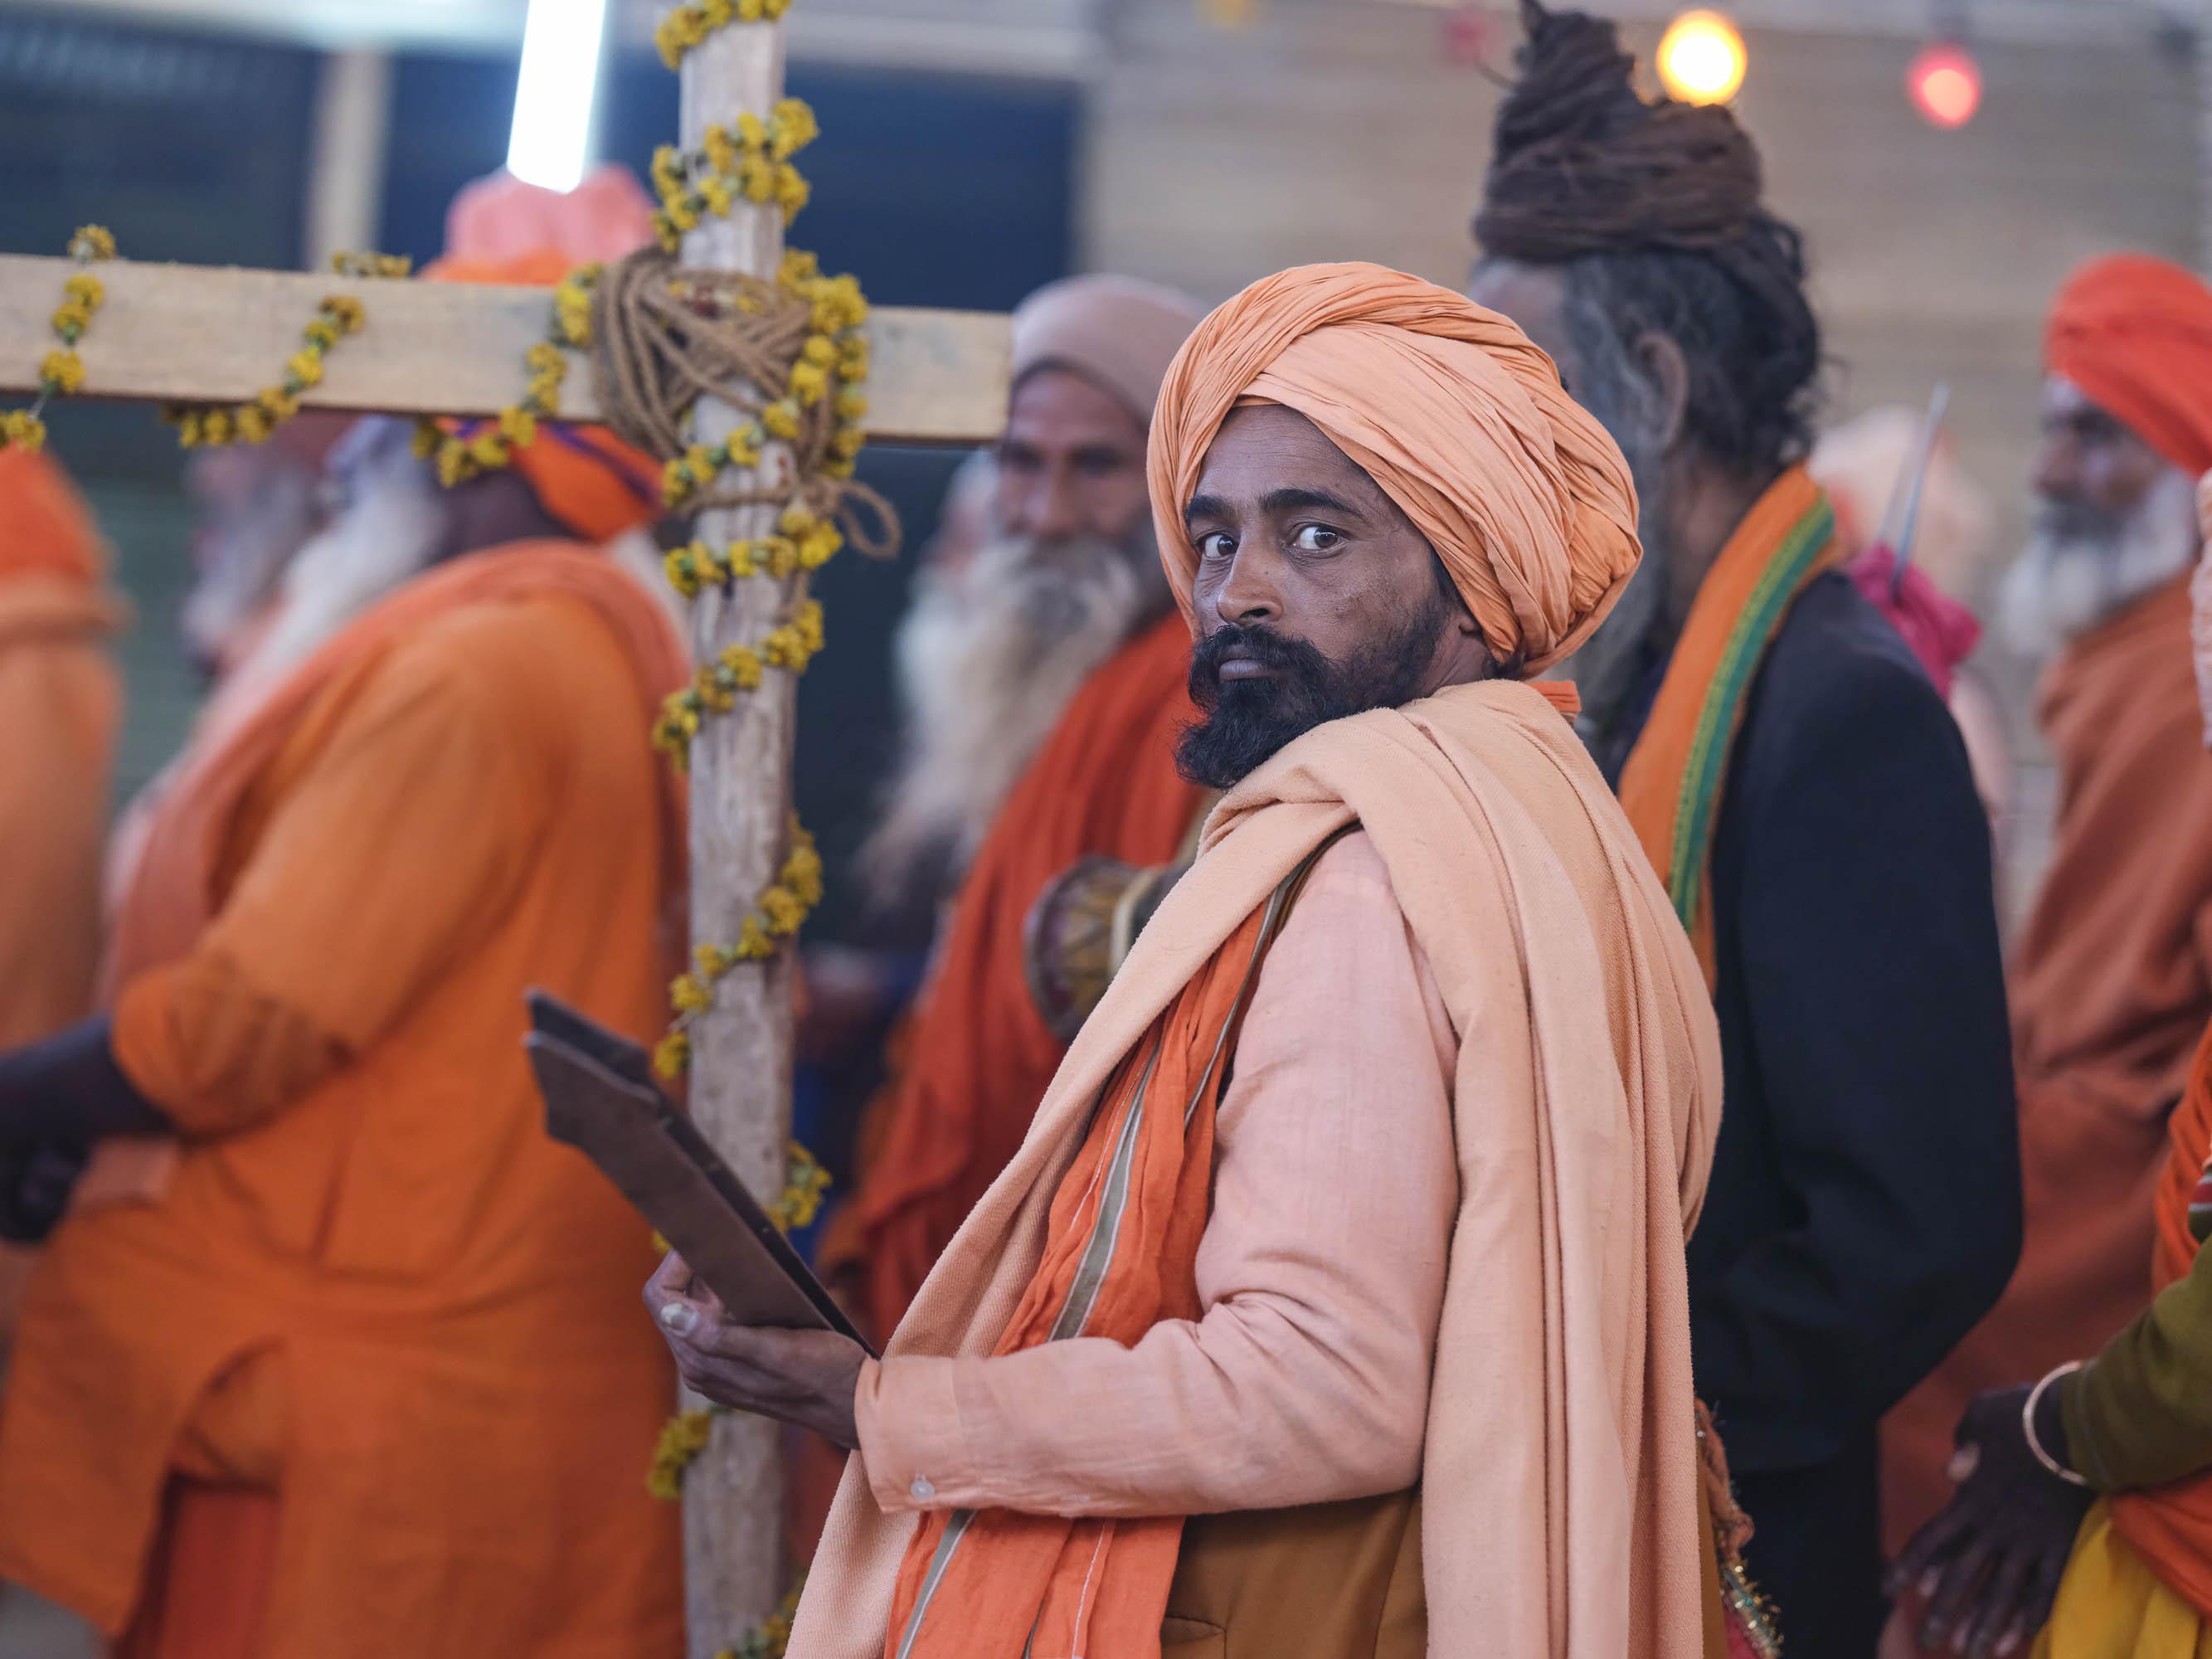 music musicien playing pilgrims Kumbh mela 2019 India Allahabad Prayagraj Ardh hindu religious Festival event rivers photographer jose jeuland photography